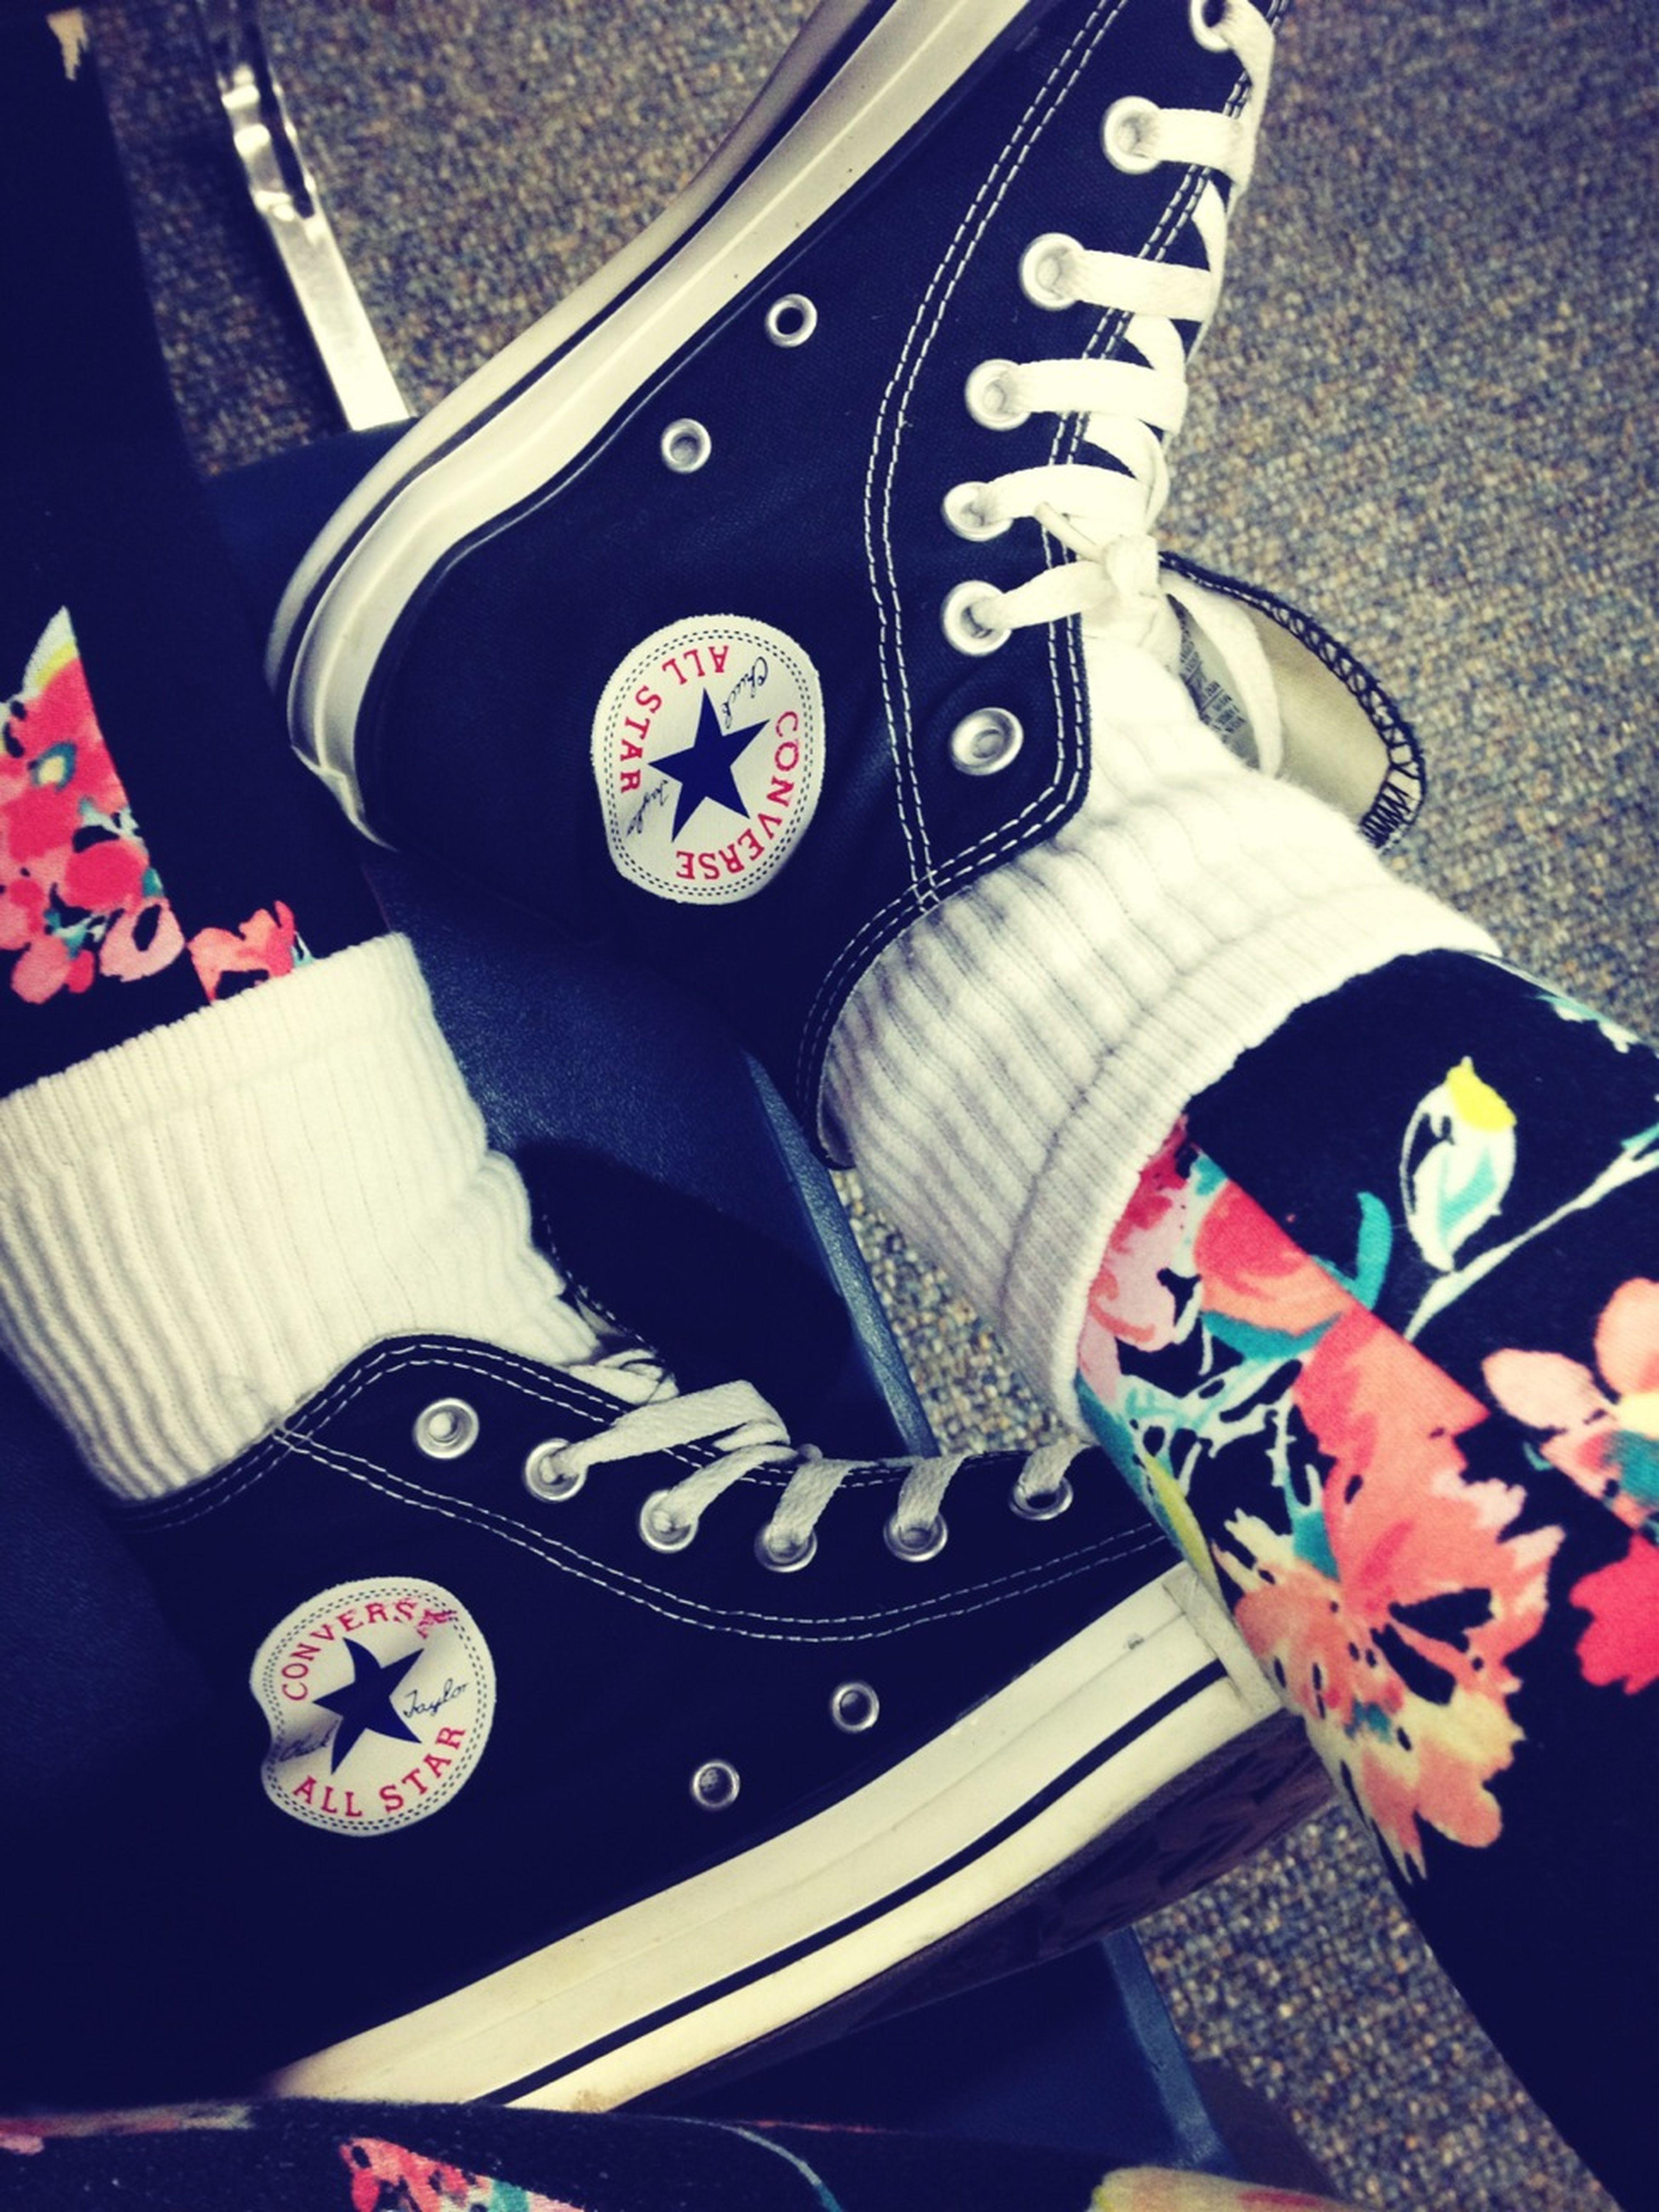 #KOTD #chucks #socks